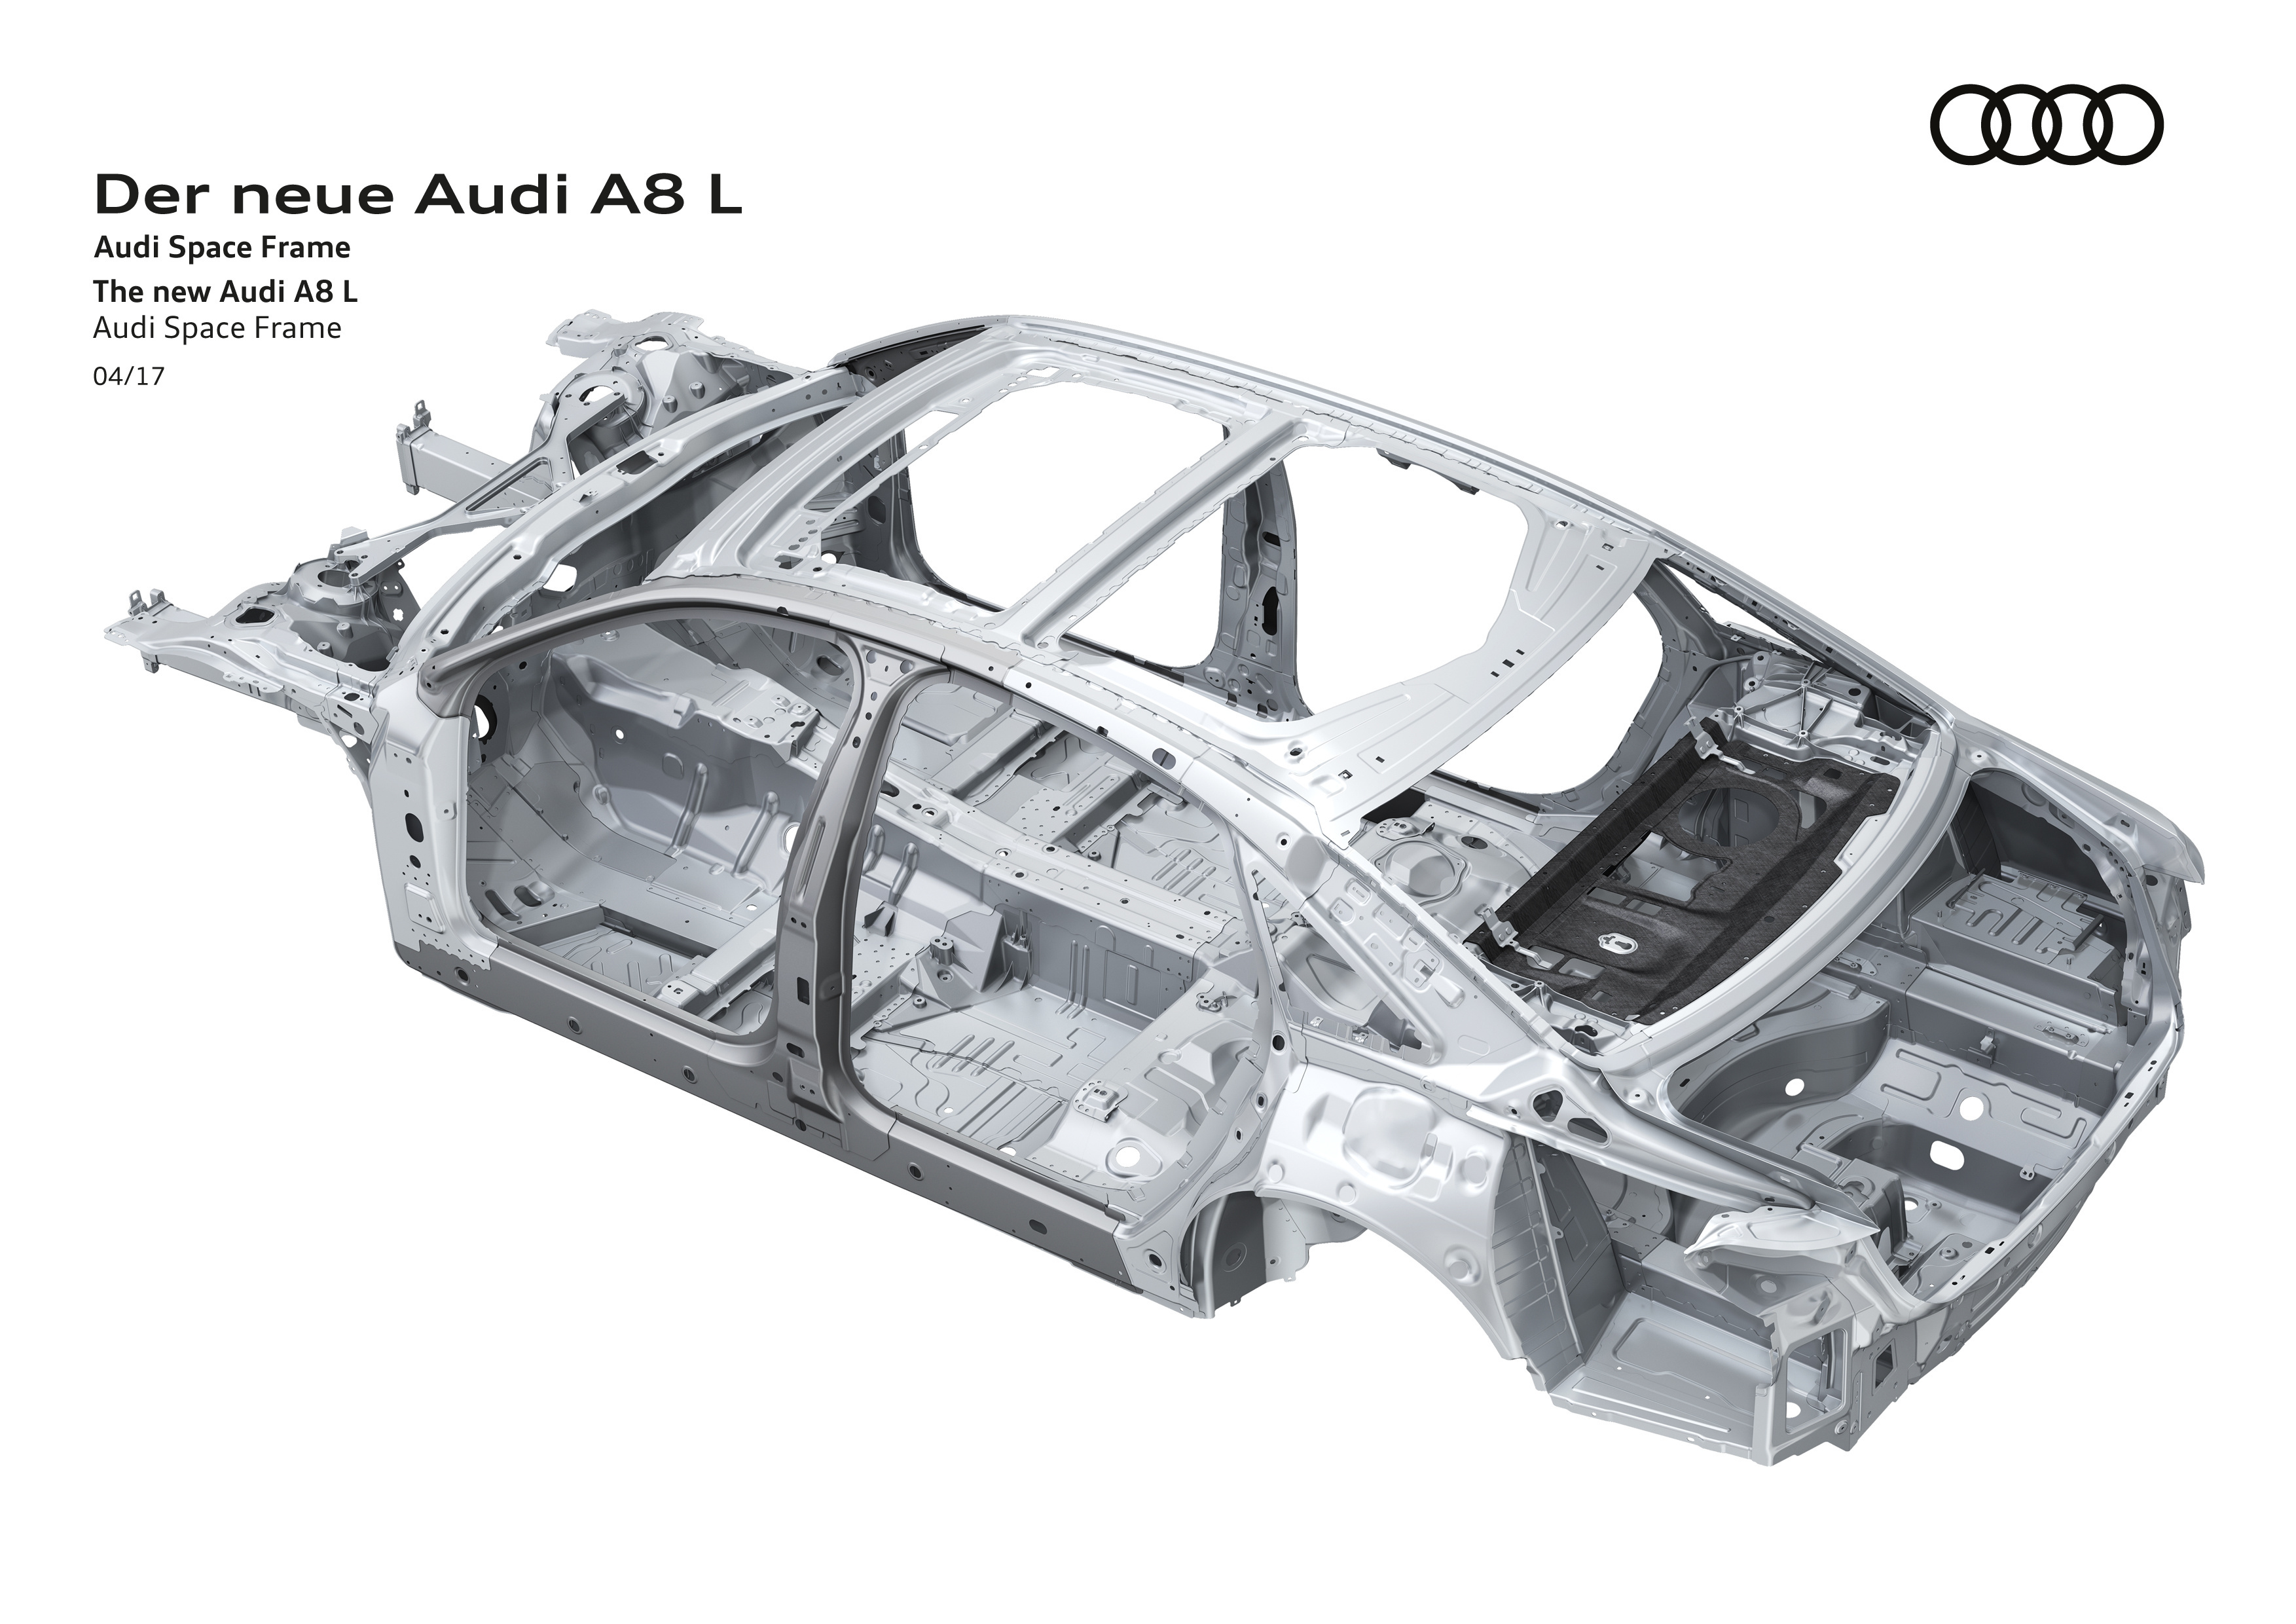 Upcoming Audi A8 uses UHSS, aluminum, carbon-fiber, magnesium ...